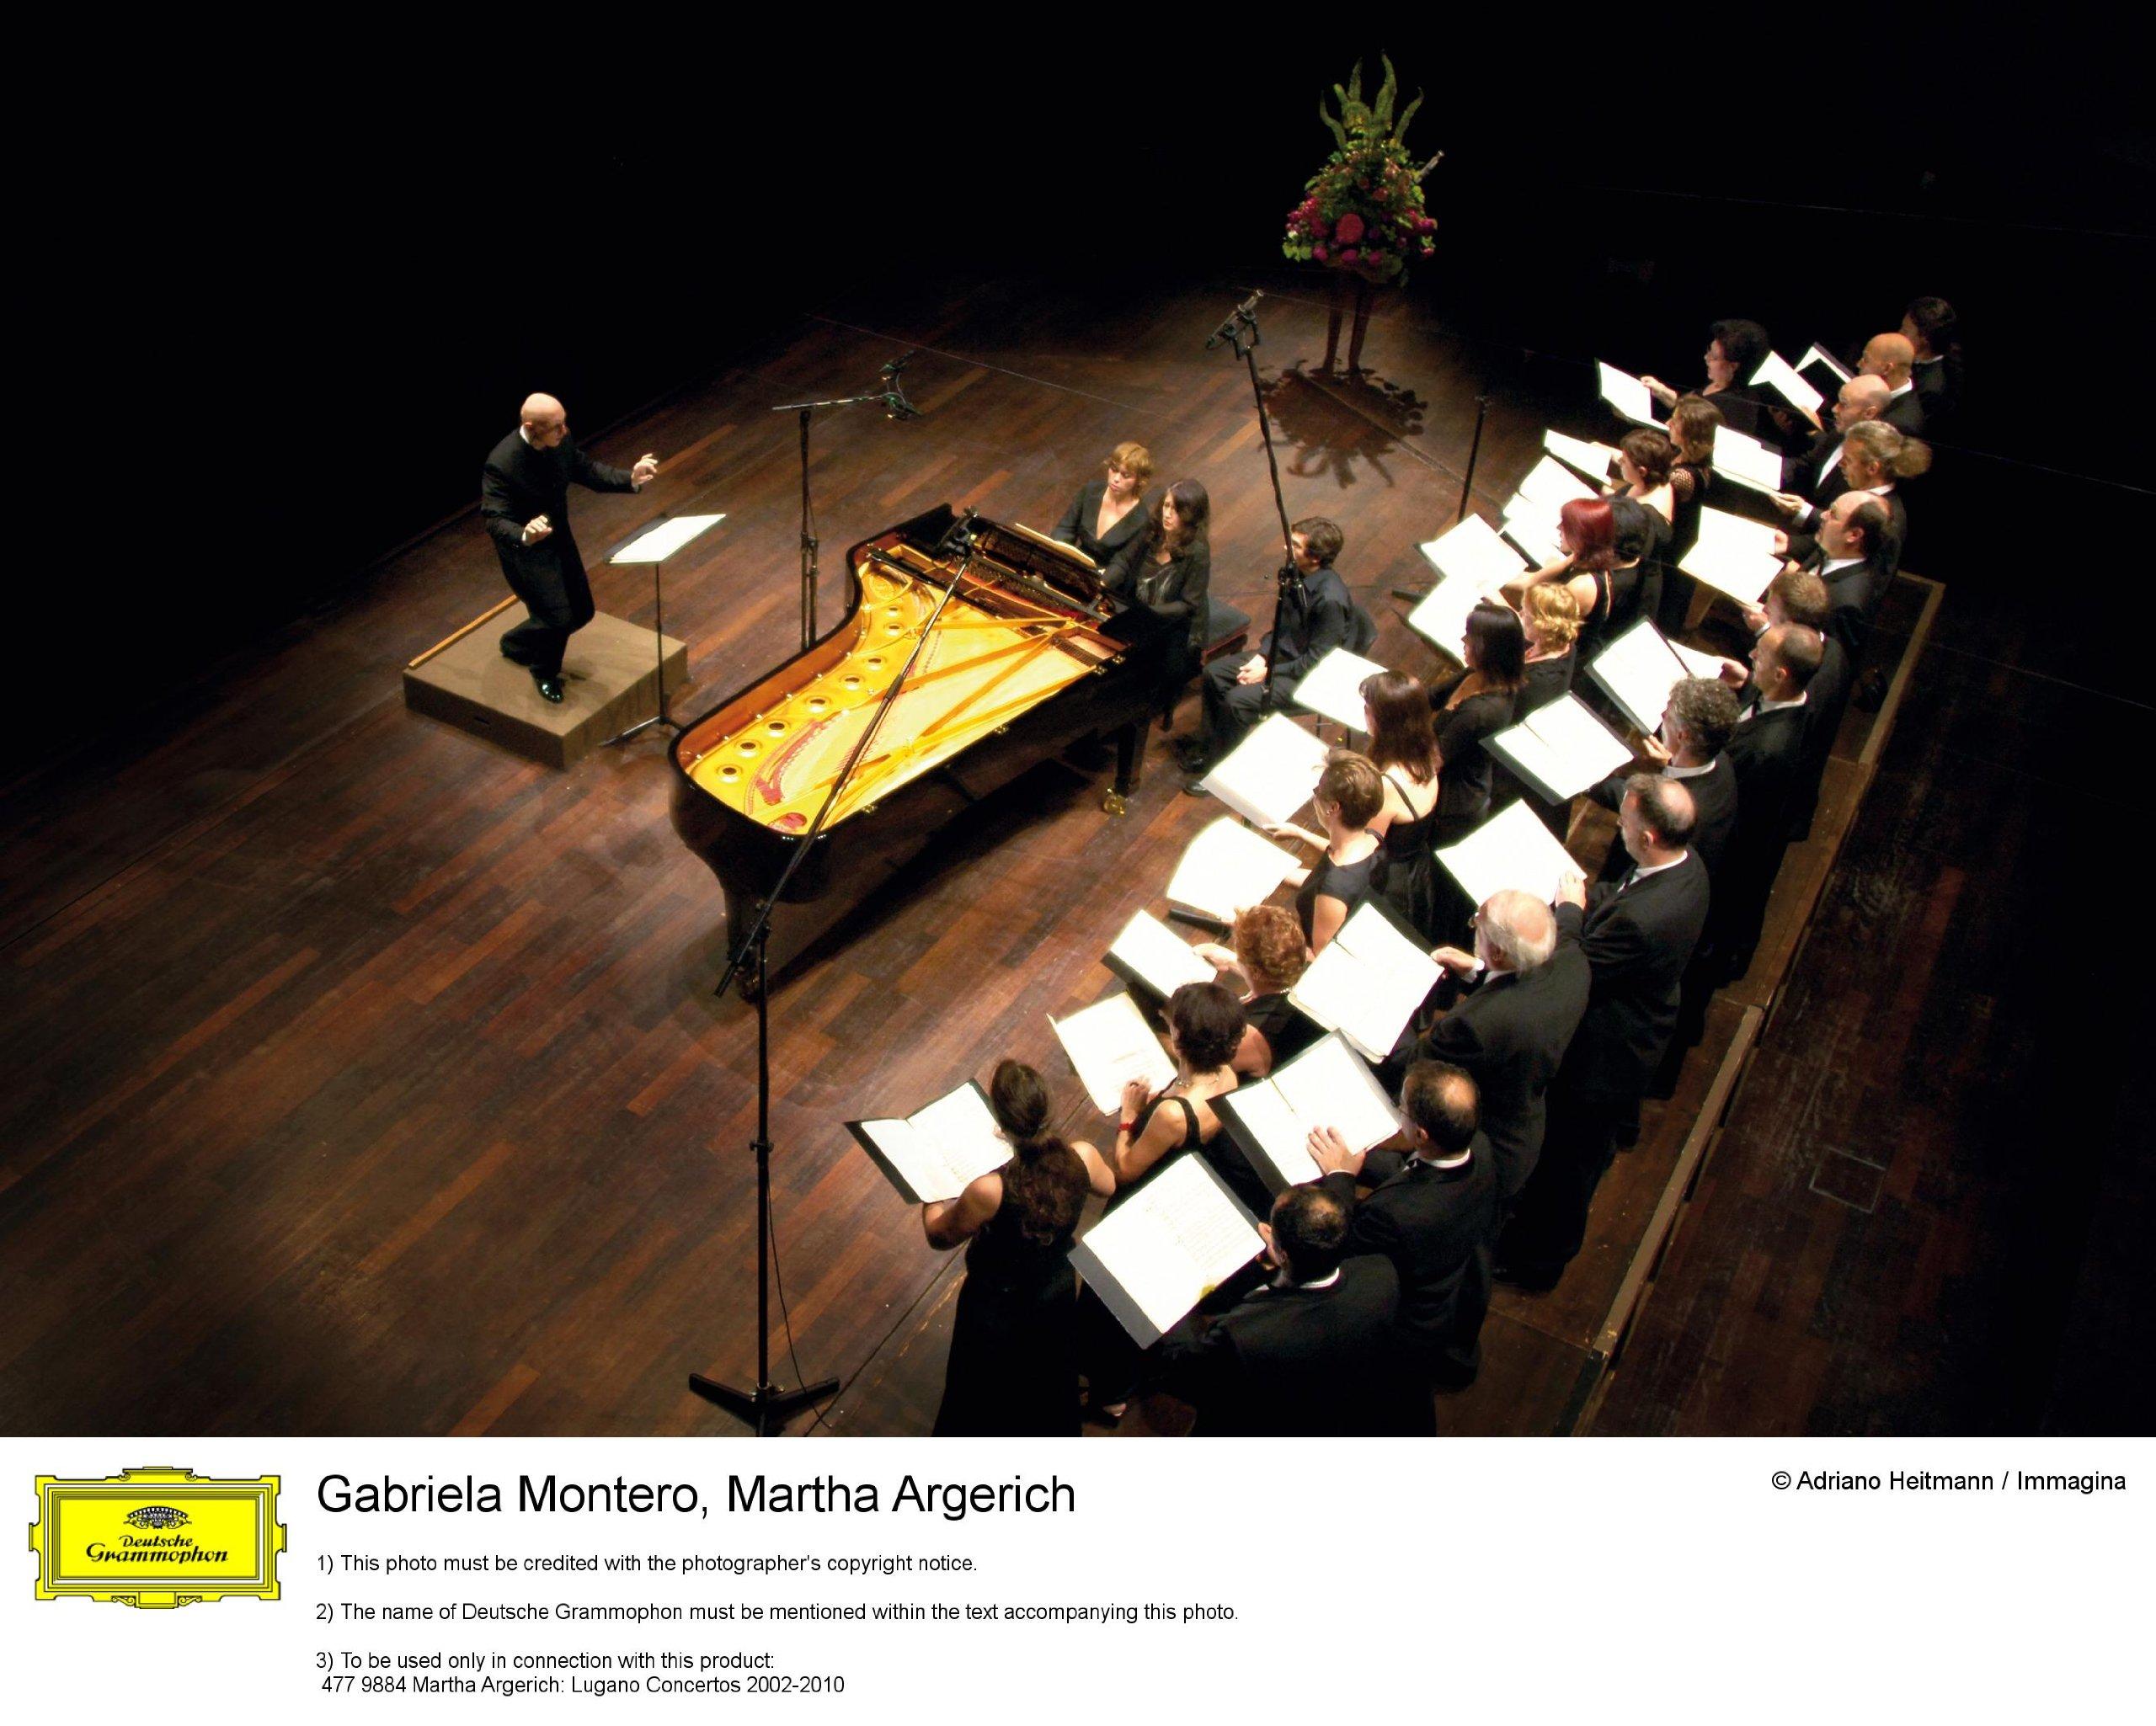 Martha Argerich: Lugano Concertos by DEUTSCHE GRAMMOPHON,BOX CLASSICA,VARI,LIVE RECORDING,